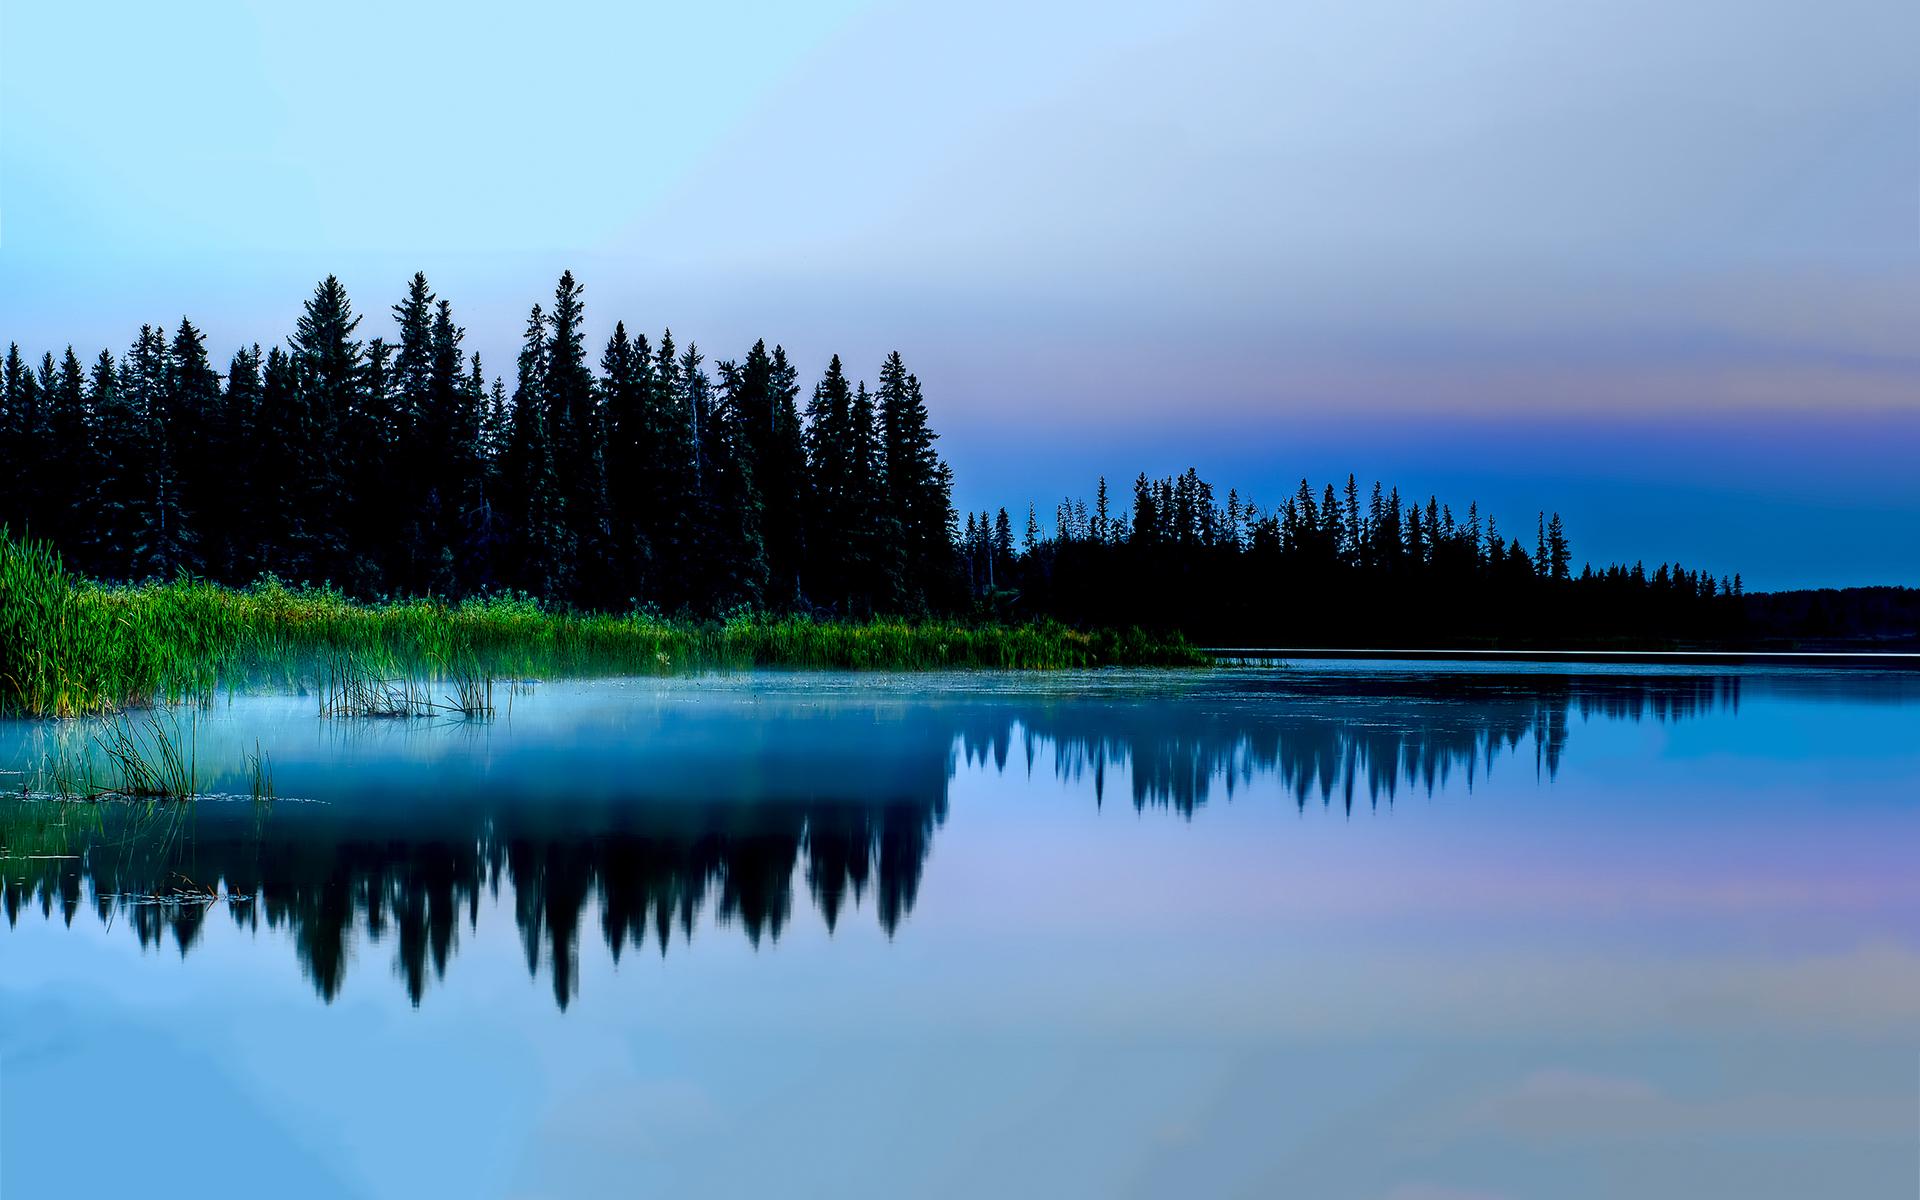 Water Falling Wallpaper Desktop Tumblr Nature Backgrounds Wallpaper 1920x1080 32336